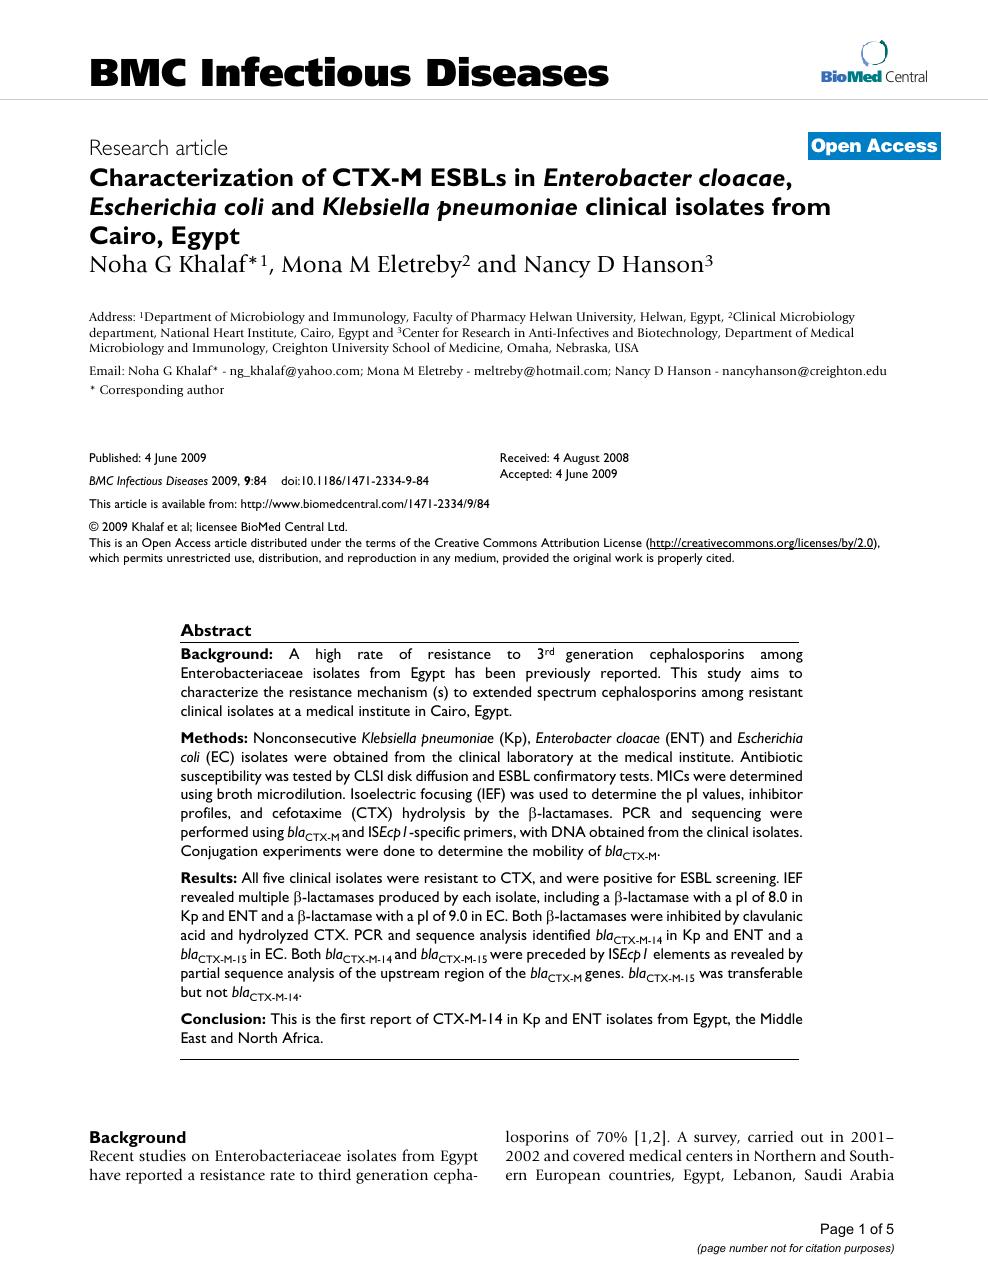 Characterization of CTX-M ESBLs in Enterobacter cloacae